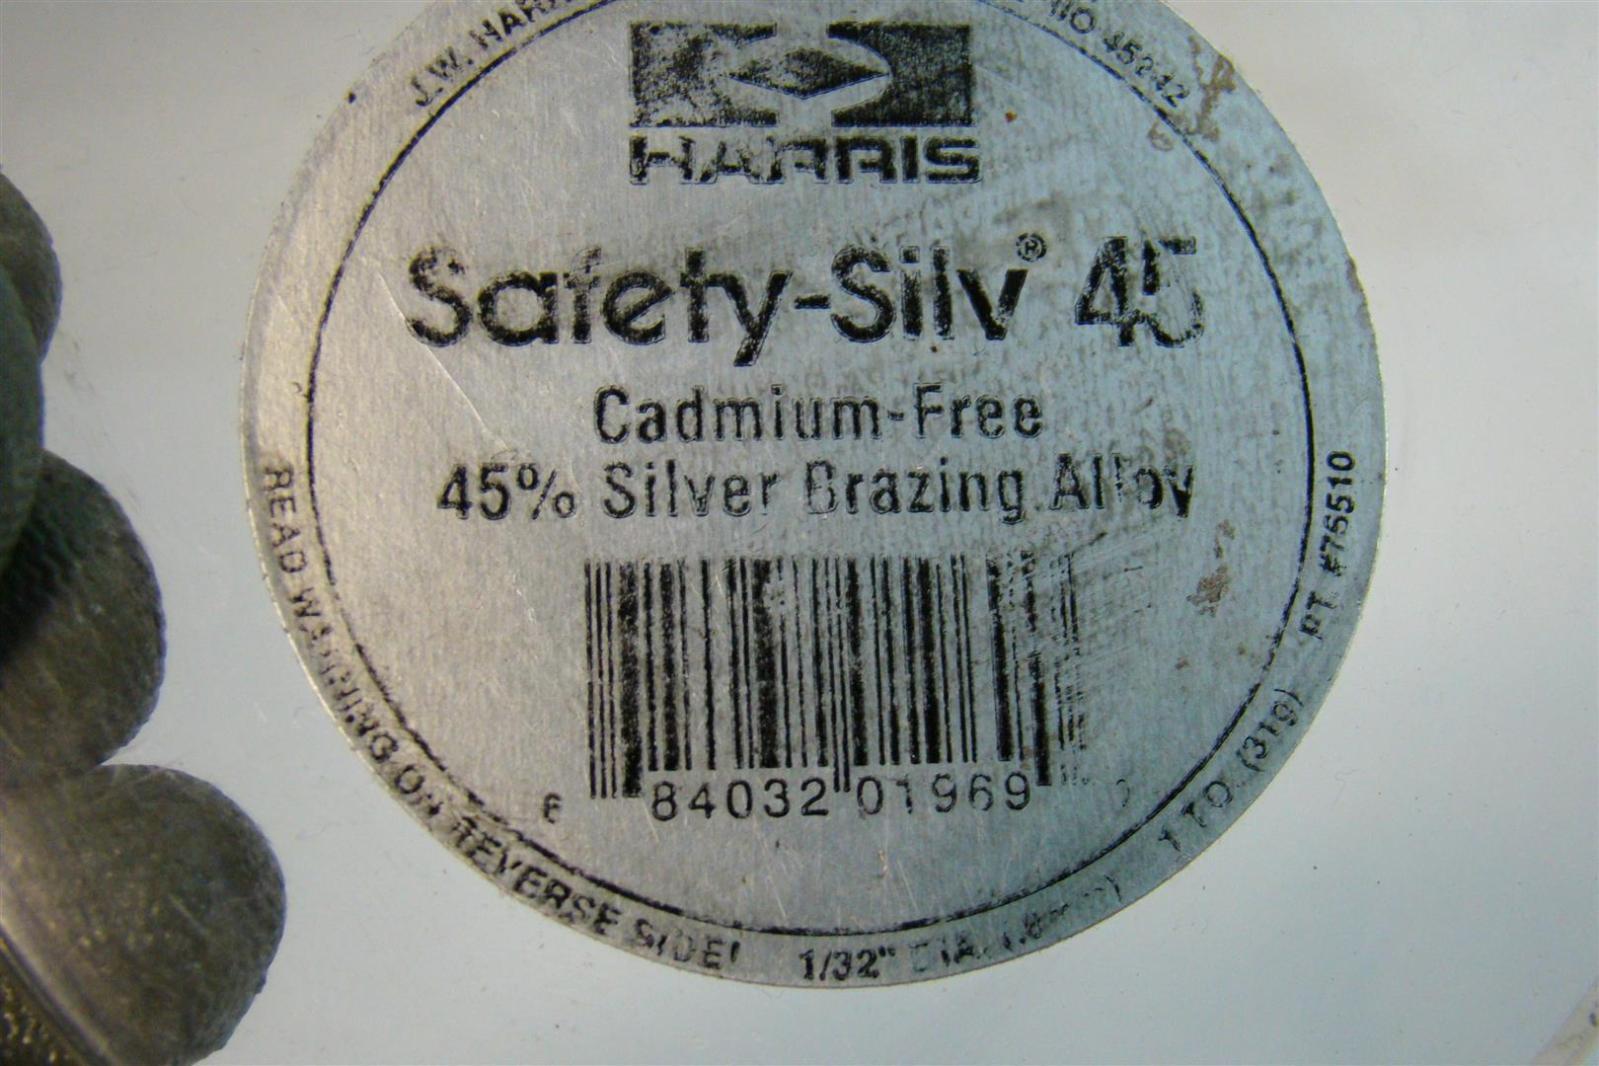 Harris safety silv cadmium free silver brazing